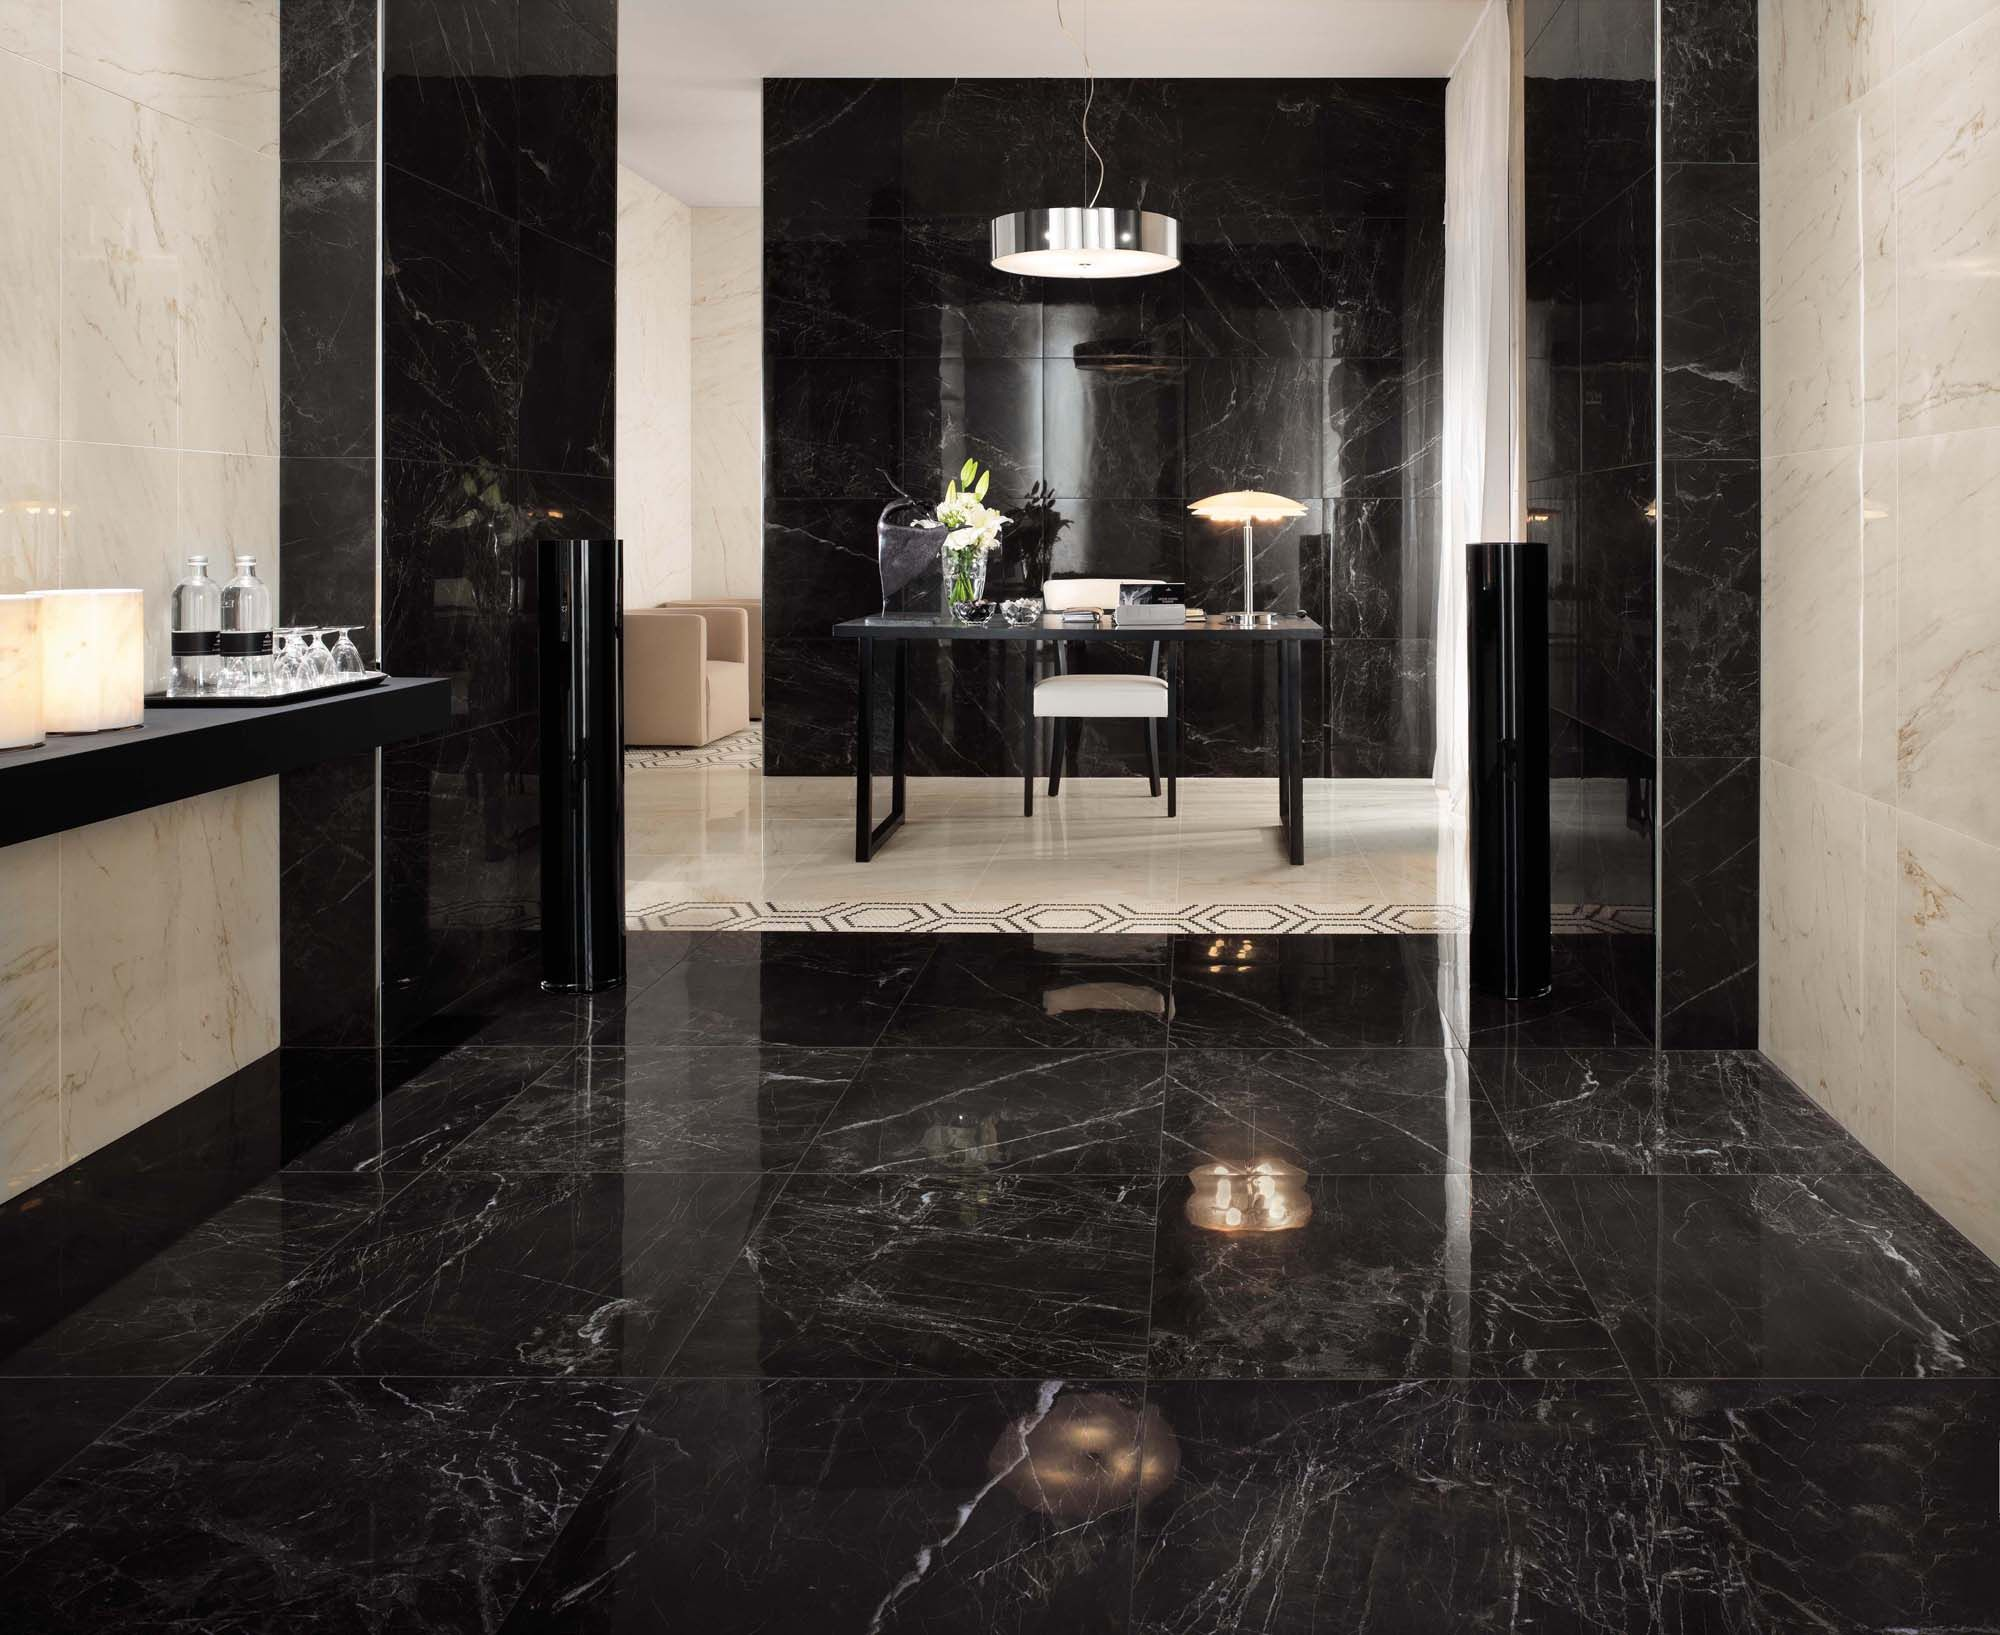 minoli floor tiles marvel noir st laurent 60 x 60 wall tiles marvel cremo delicato. Black Bedroom Furniture Sets. Home Design Ideas